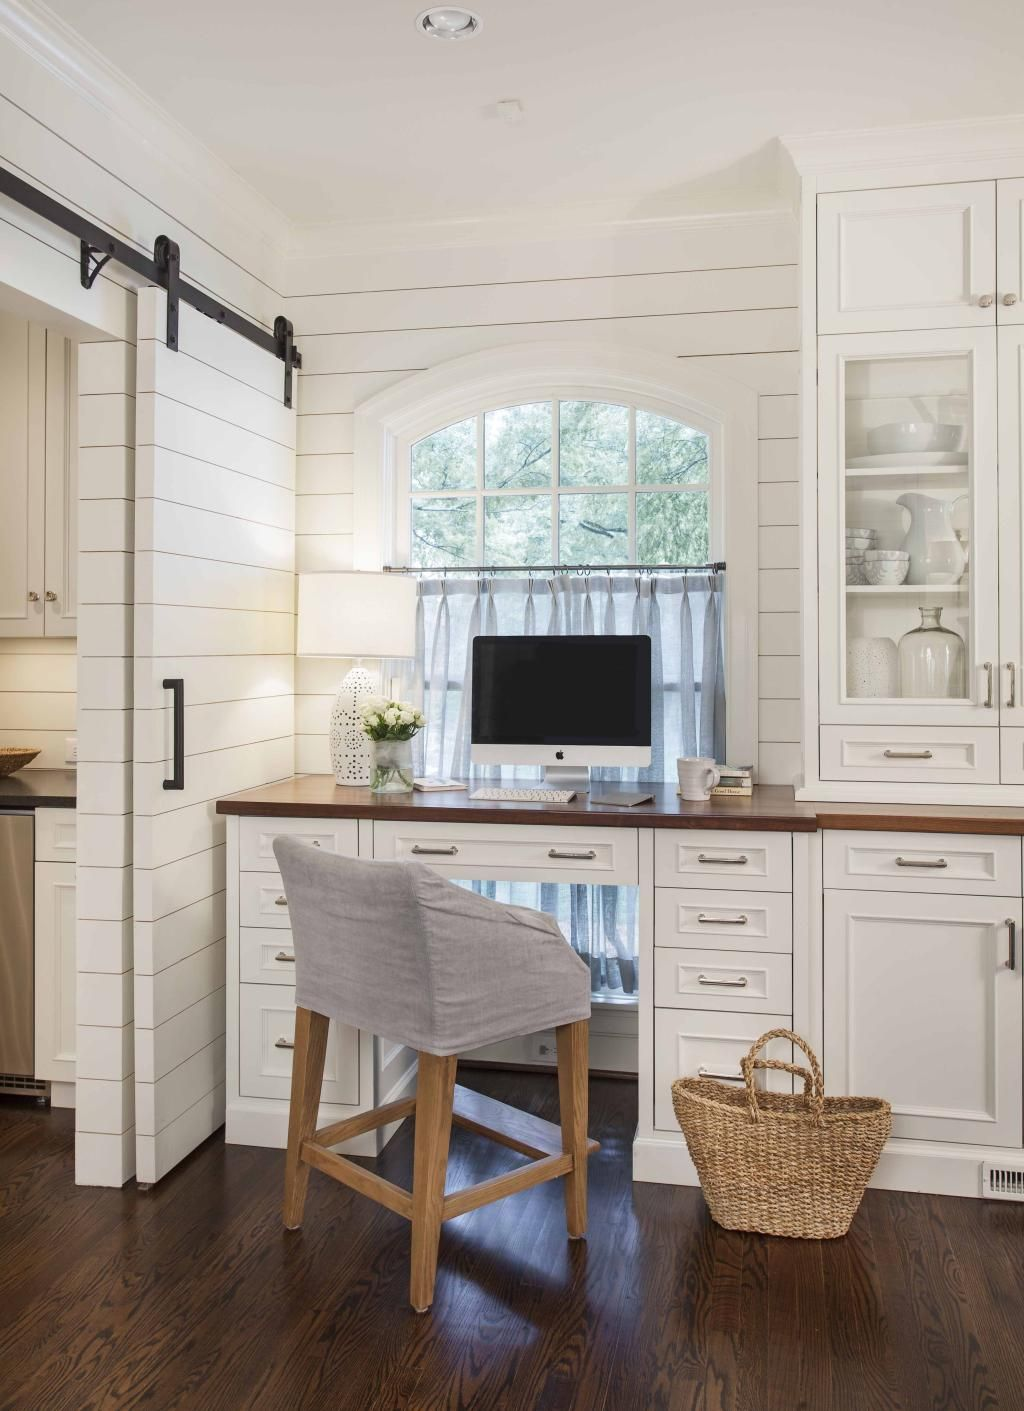 Kitchen Organization Pantry Small Spaces